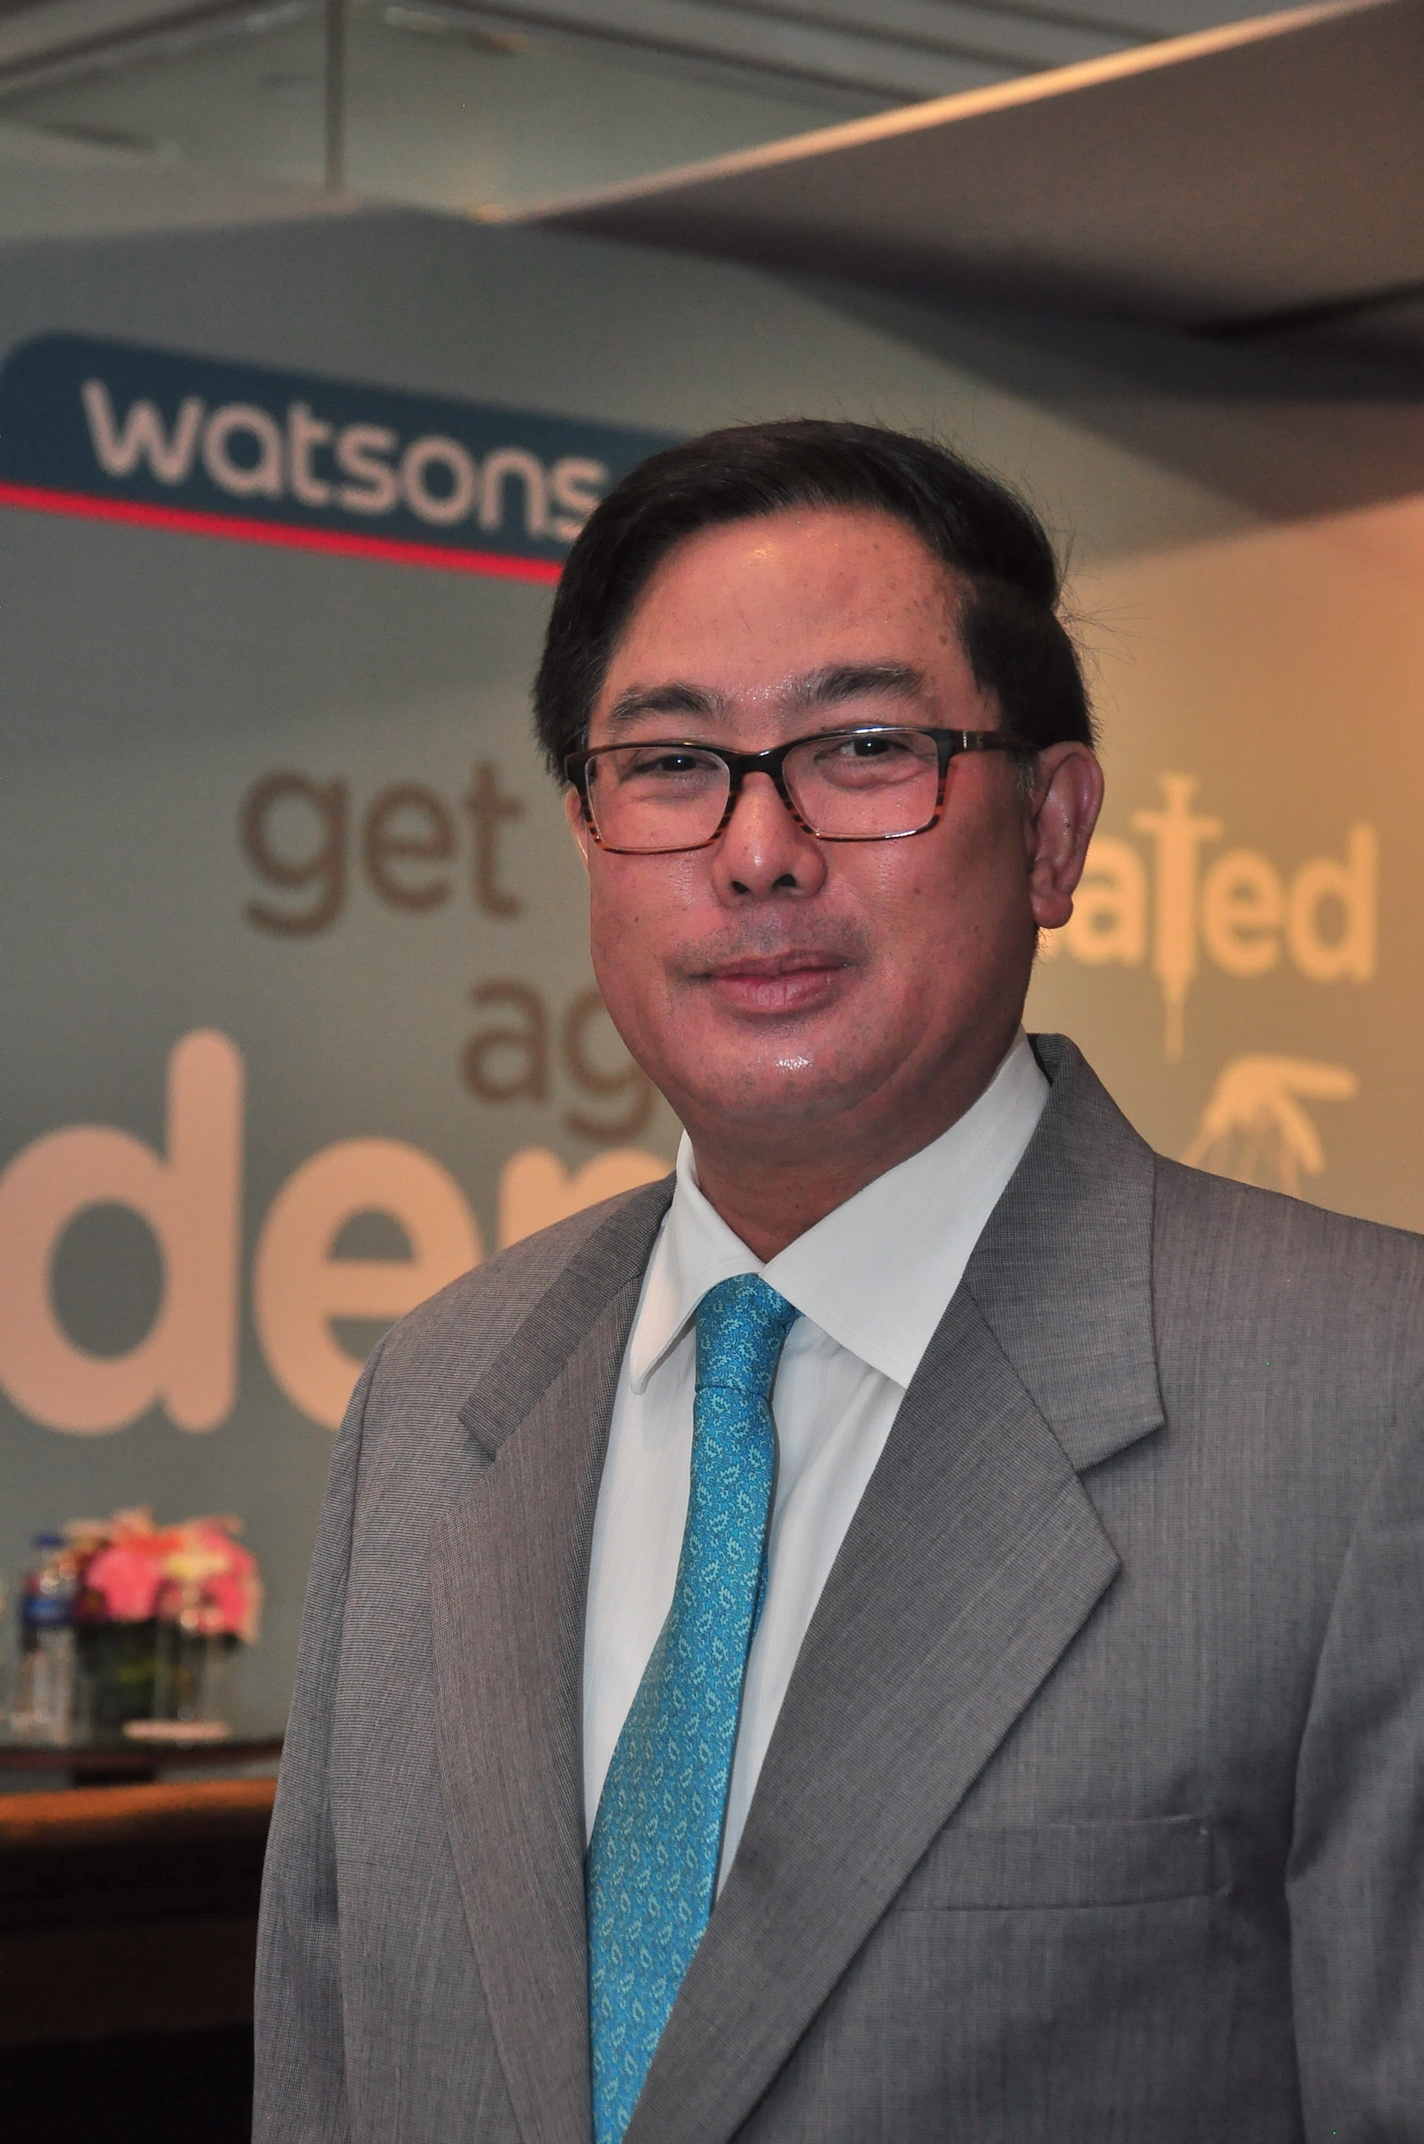 Watsons Trading Health Director Danilo Chong